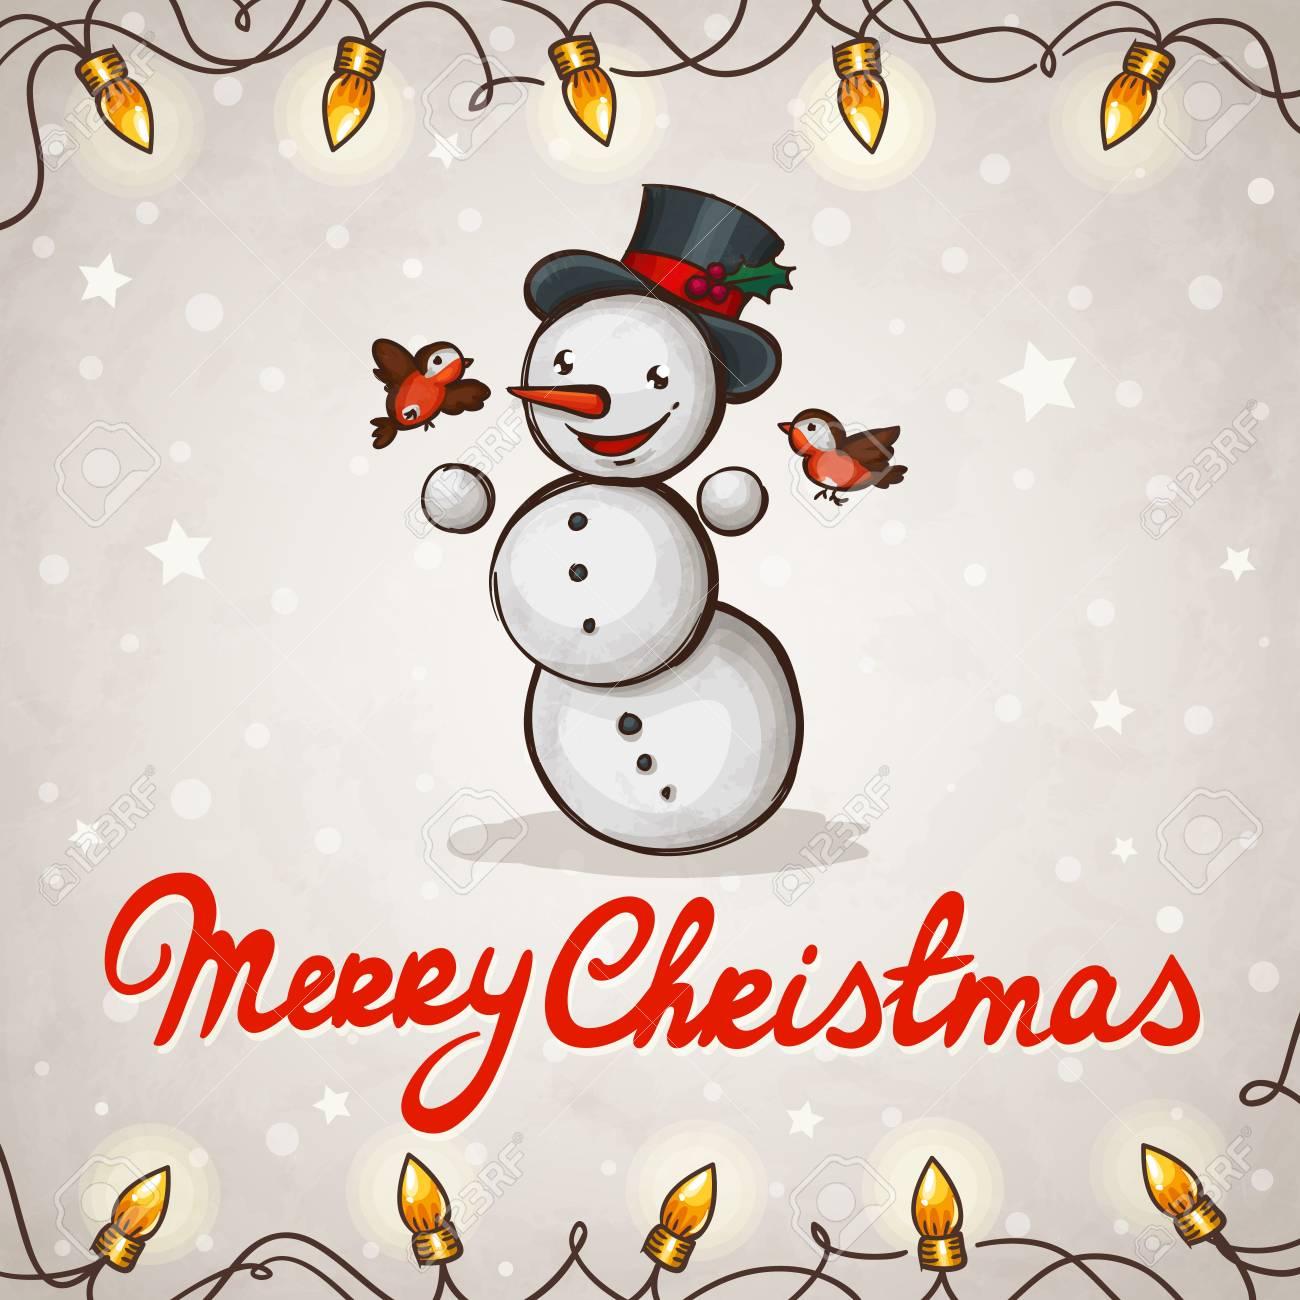 Snowman greeting card Merry Christmas Stock Vector - 16332627